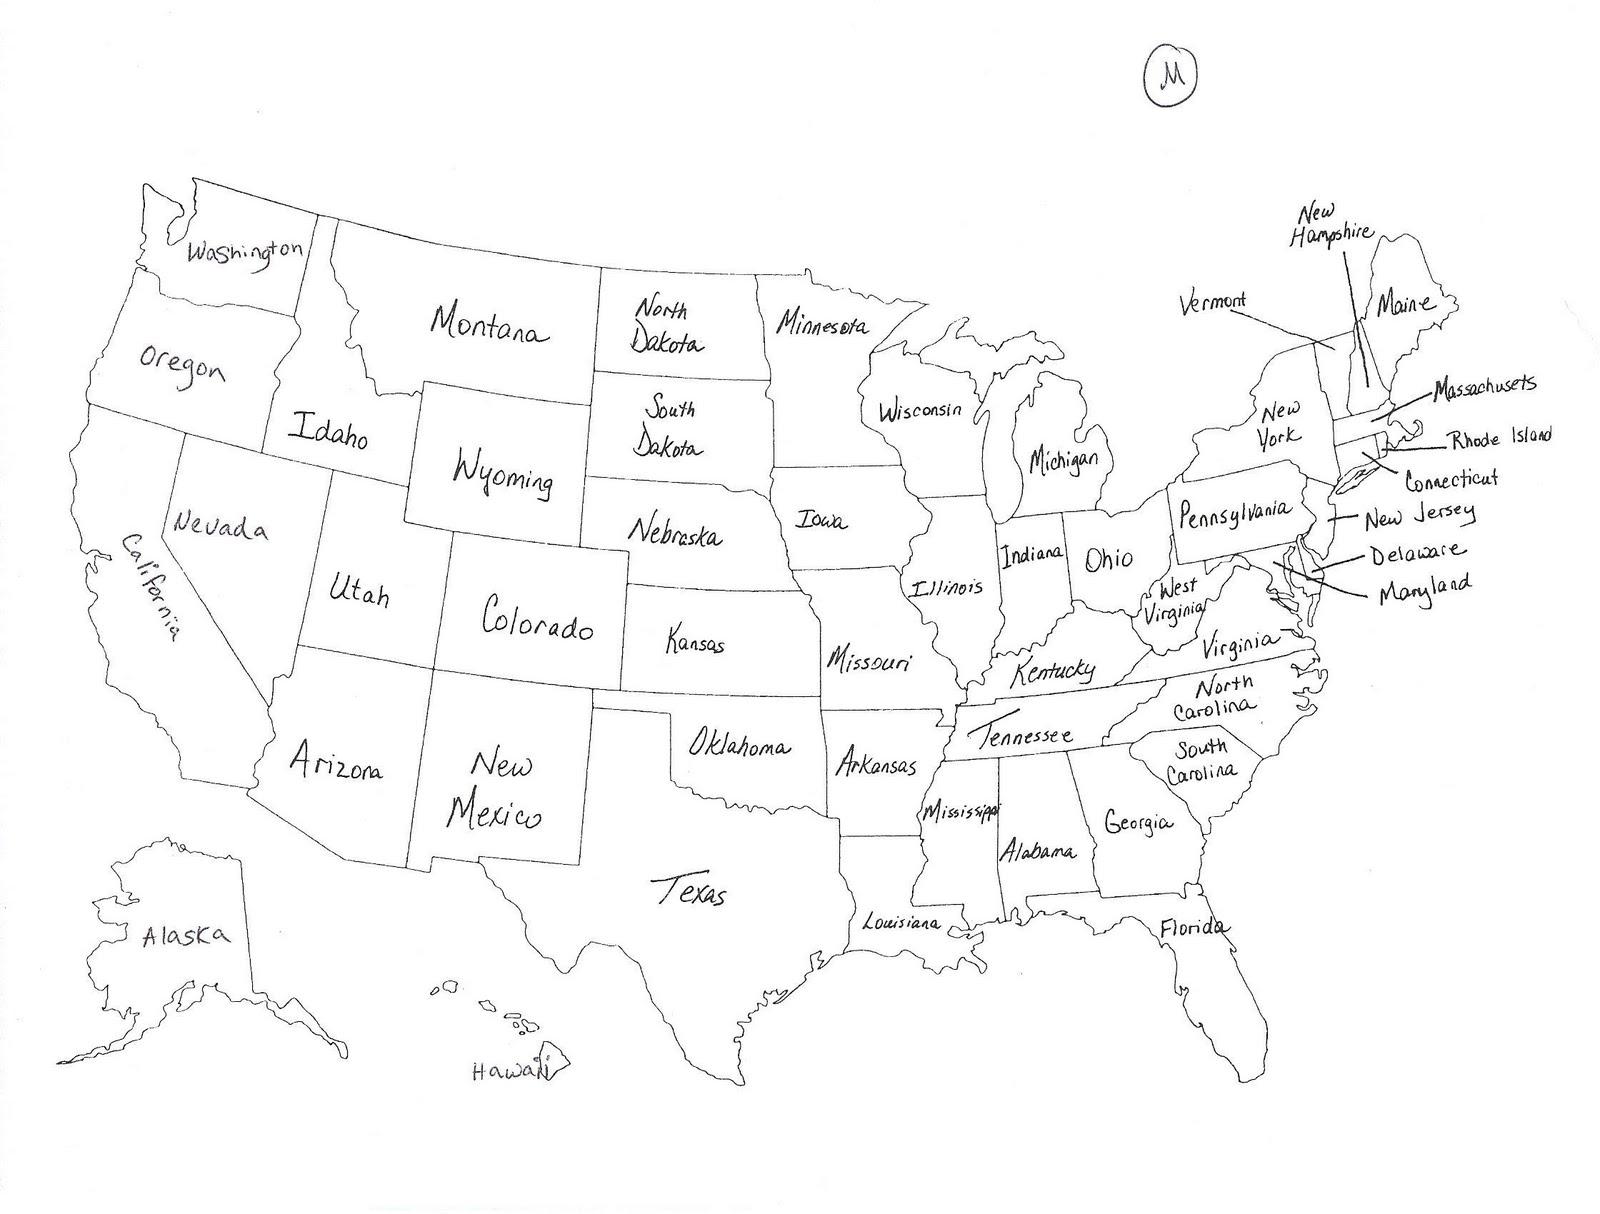 8th Grade U S History Map Quiz 1 - Us-history-map-quiz